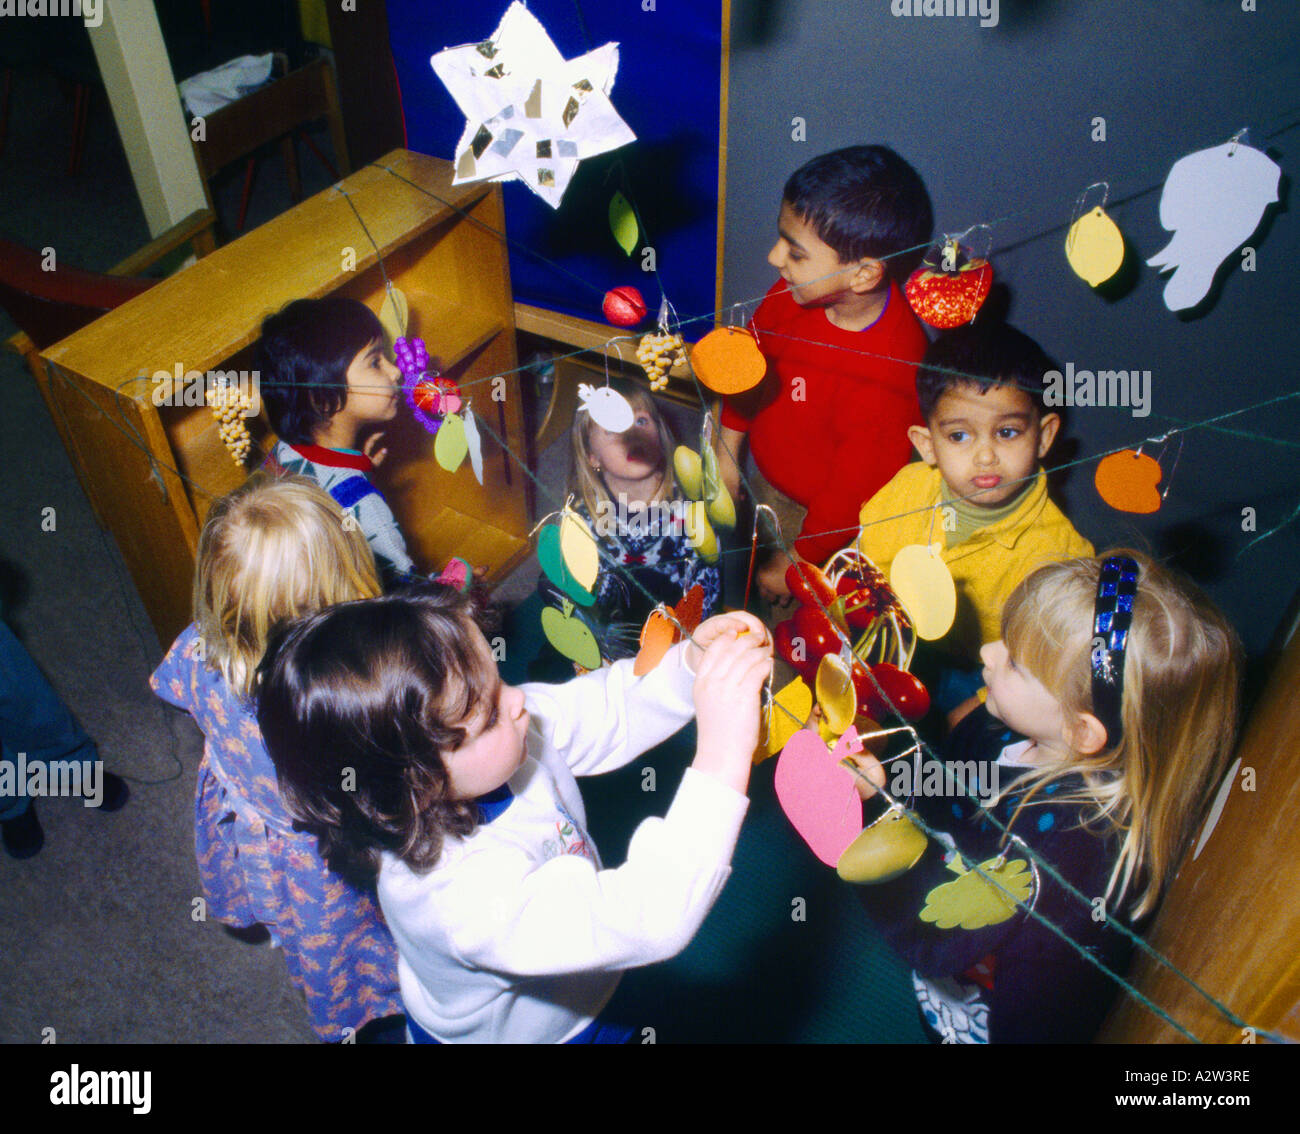 Sukkot Making A Sukkah (jewish Harvest Festival) In Nursery School - Stock Image